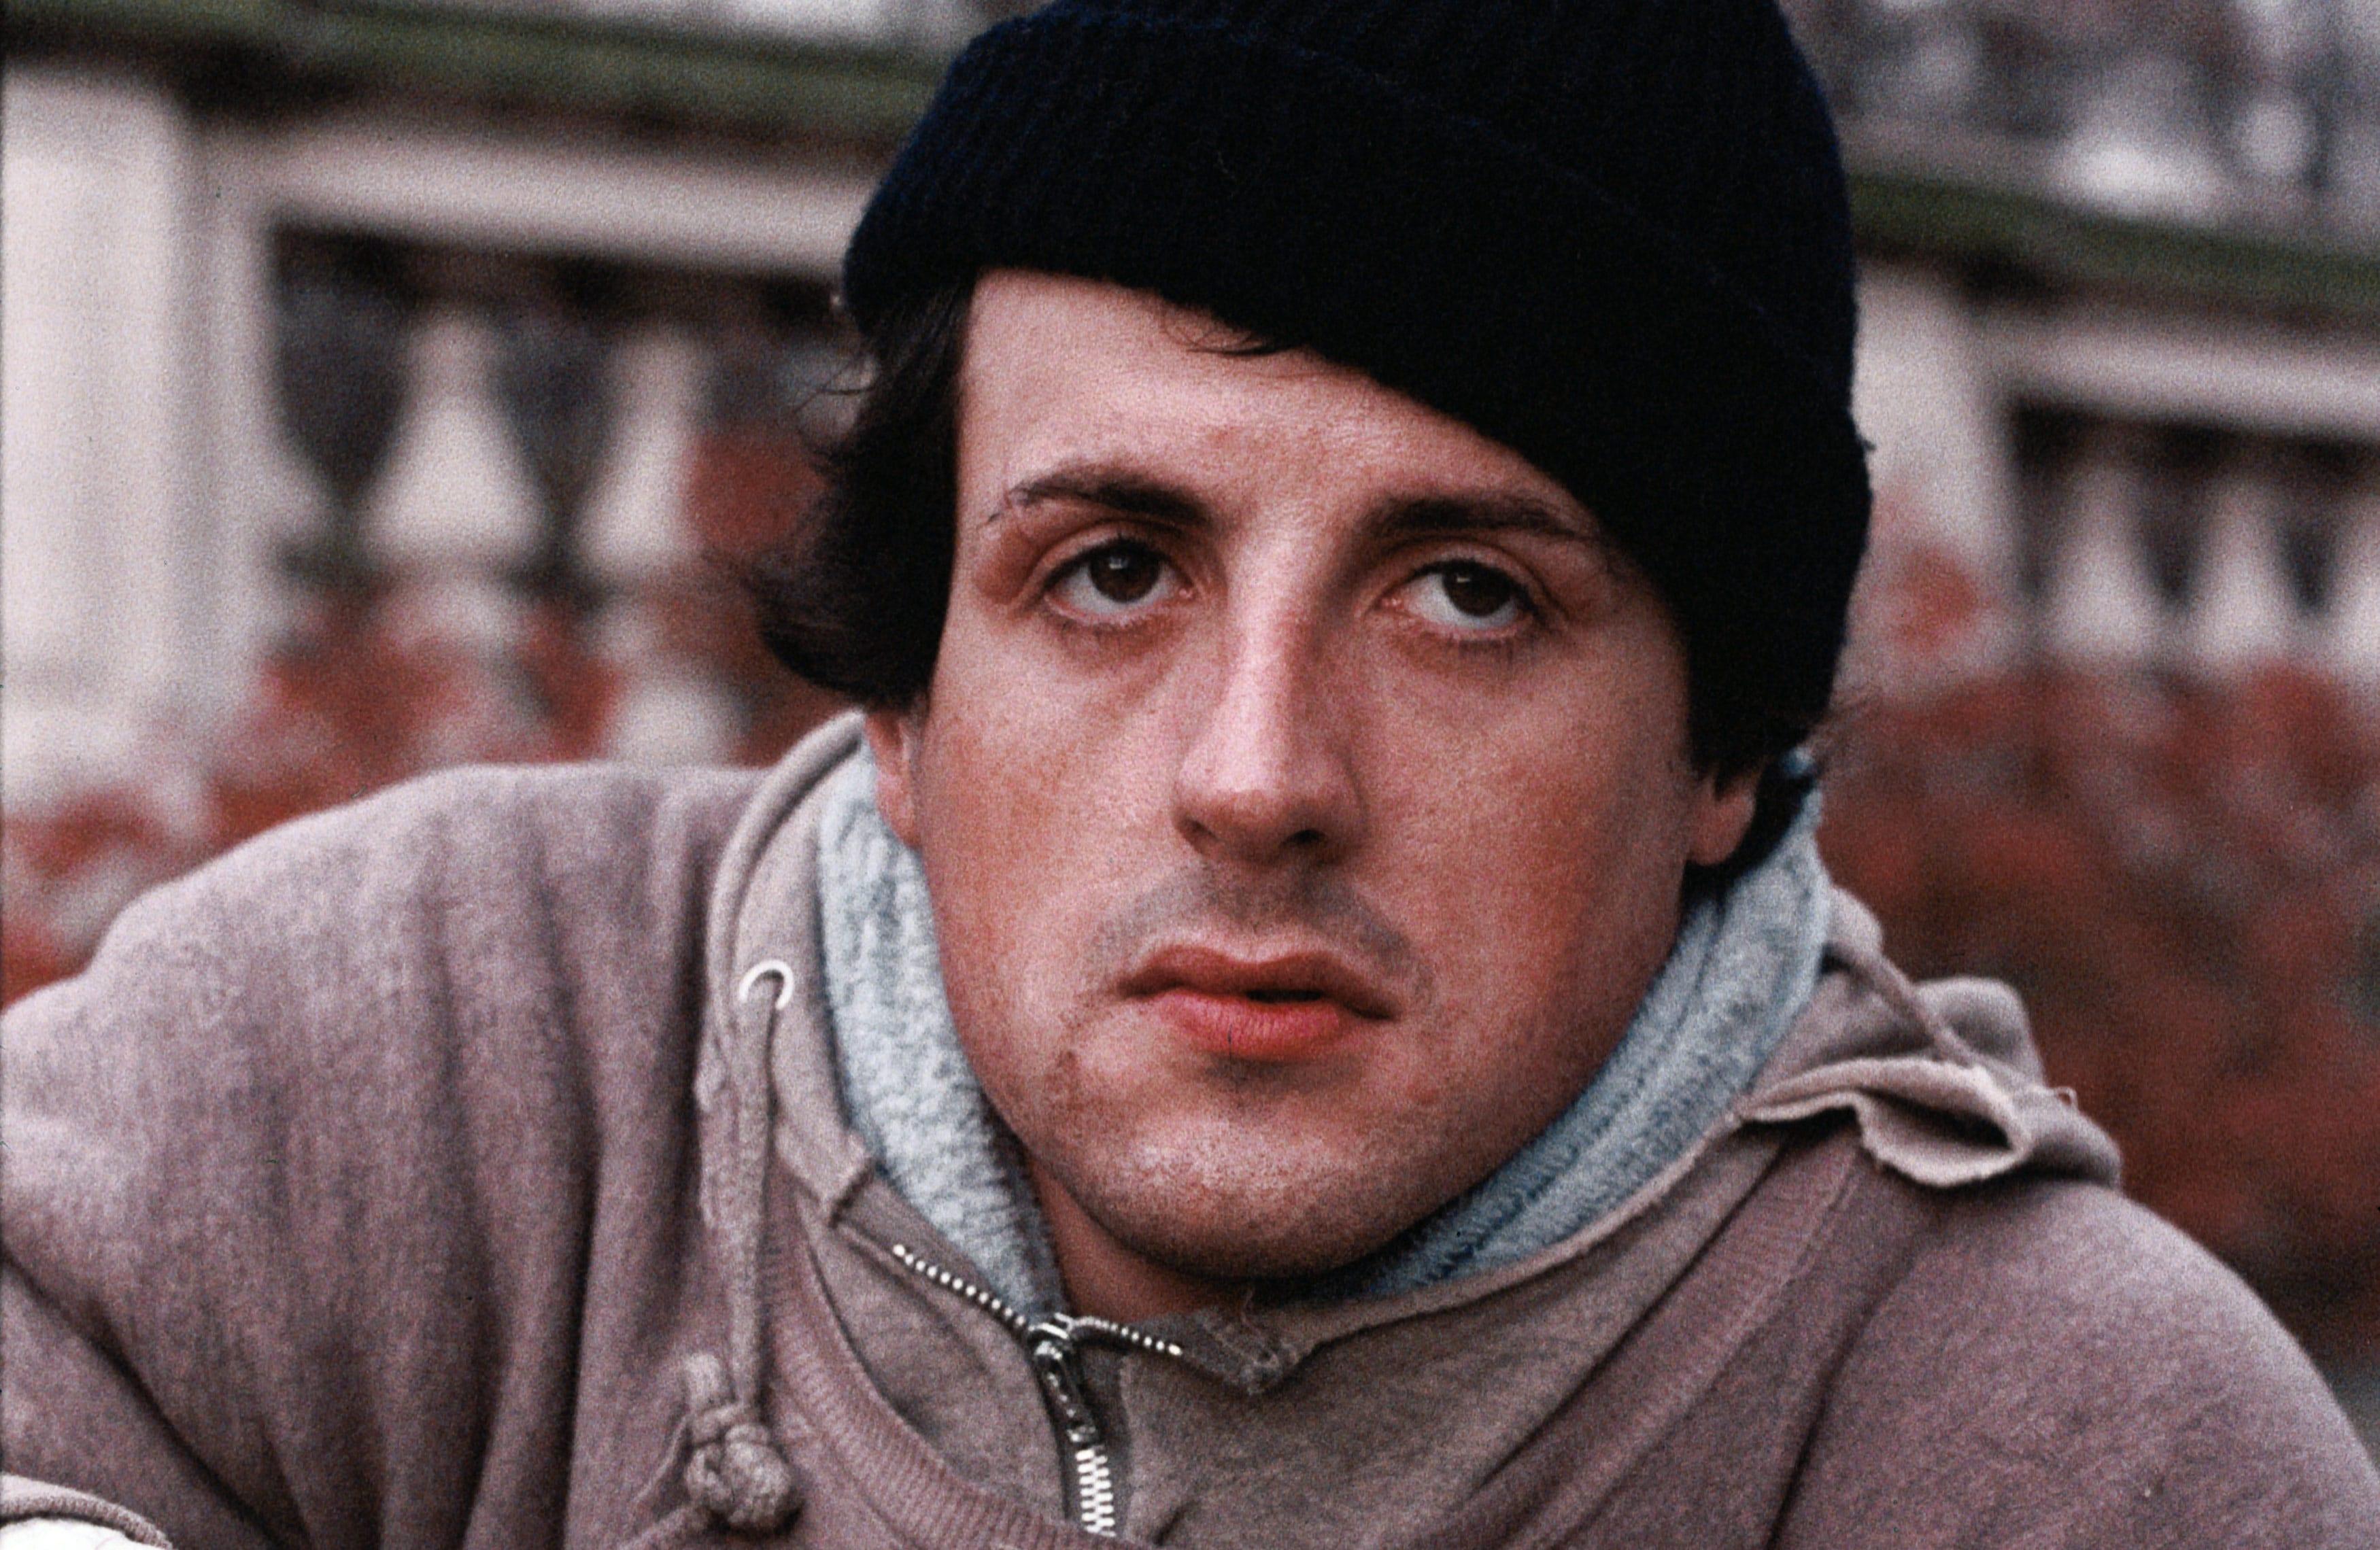 Life sylvester stallone young Sylvester Stallone